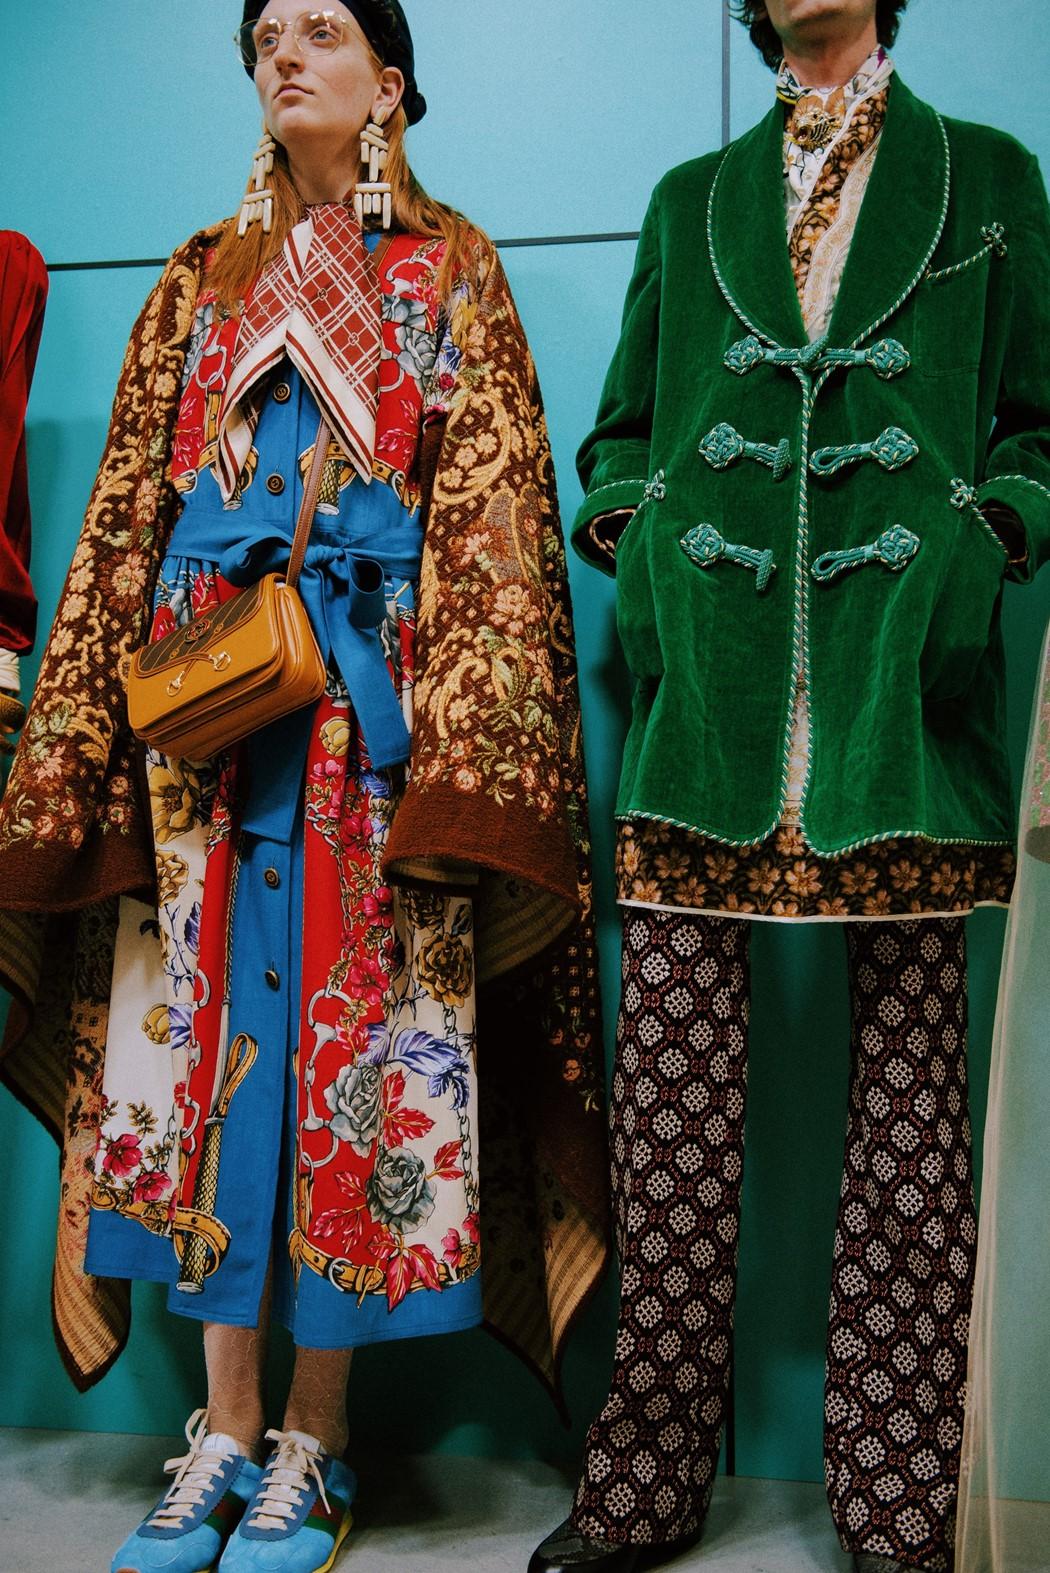 c4d24cb5a Runway: Gucci Fall 2018 Ready-to-wear Milan Fashion Week   Cool Chic ...